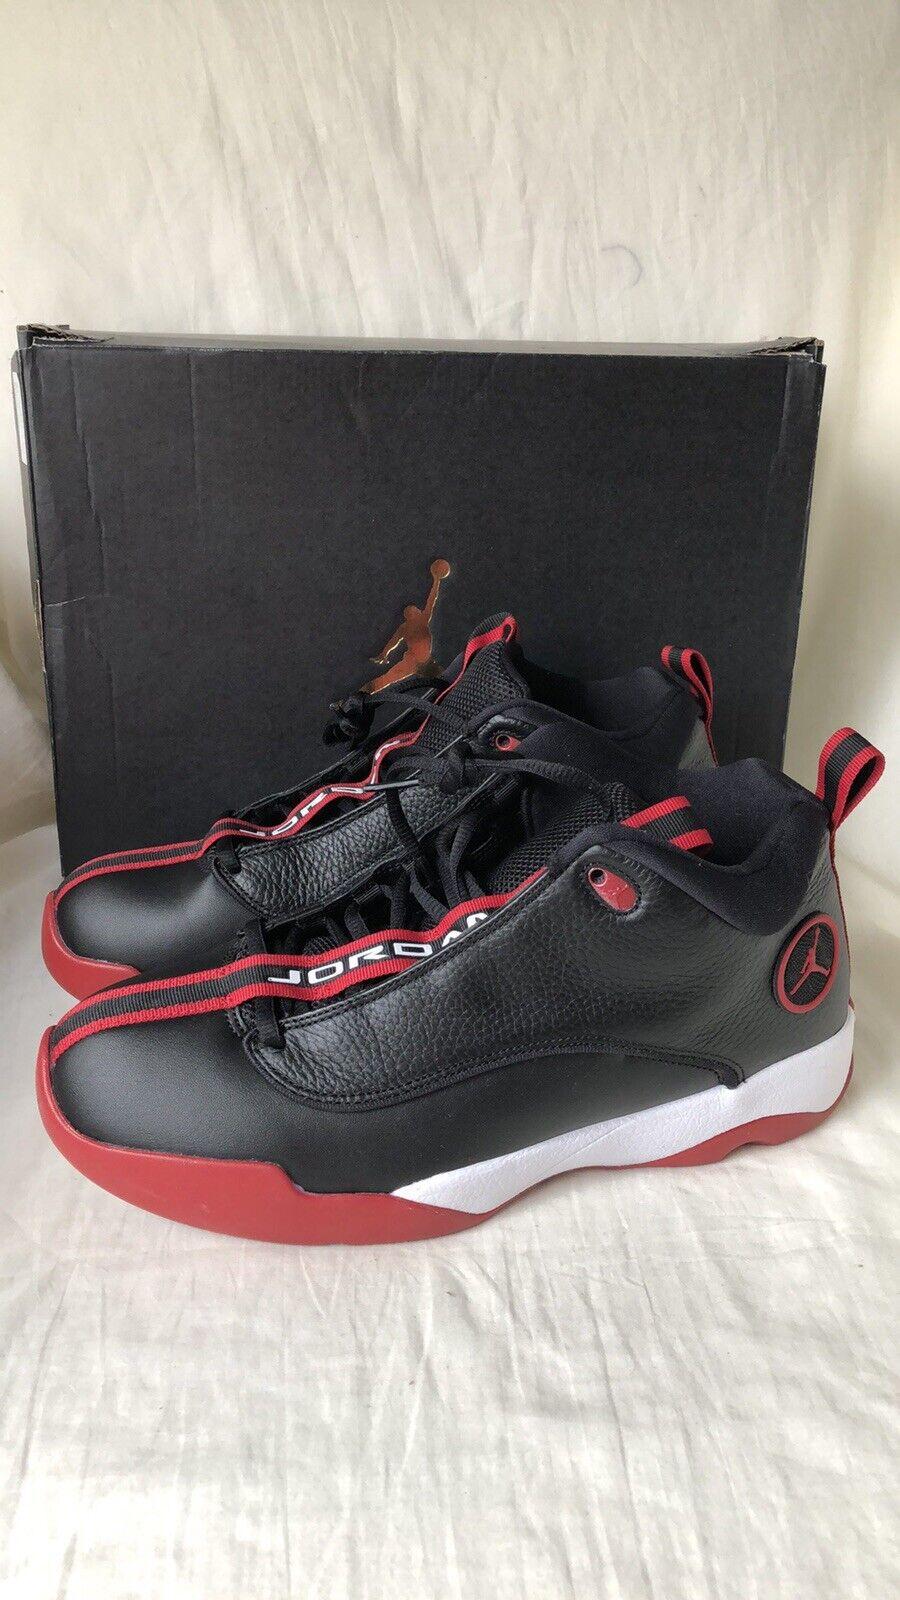 hot sale online 6c5a7 118a0 ... New DS Size 9,. Air Jordan Jump Man Pro Quick Sneakers Men Men Men Size  10 82ffa7